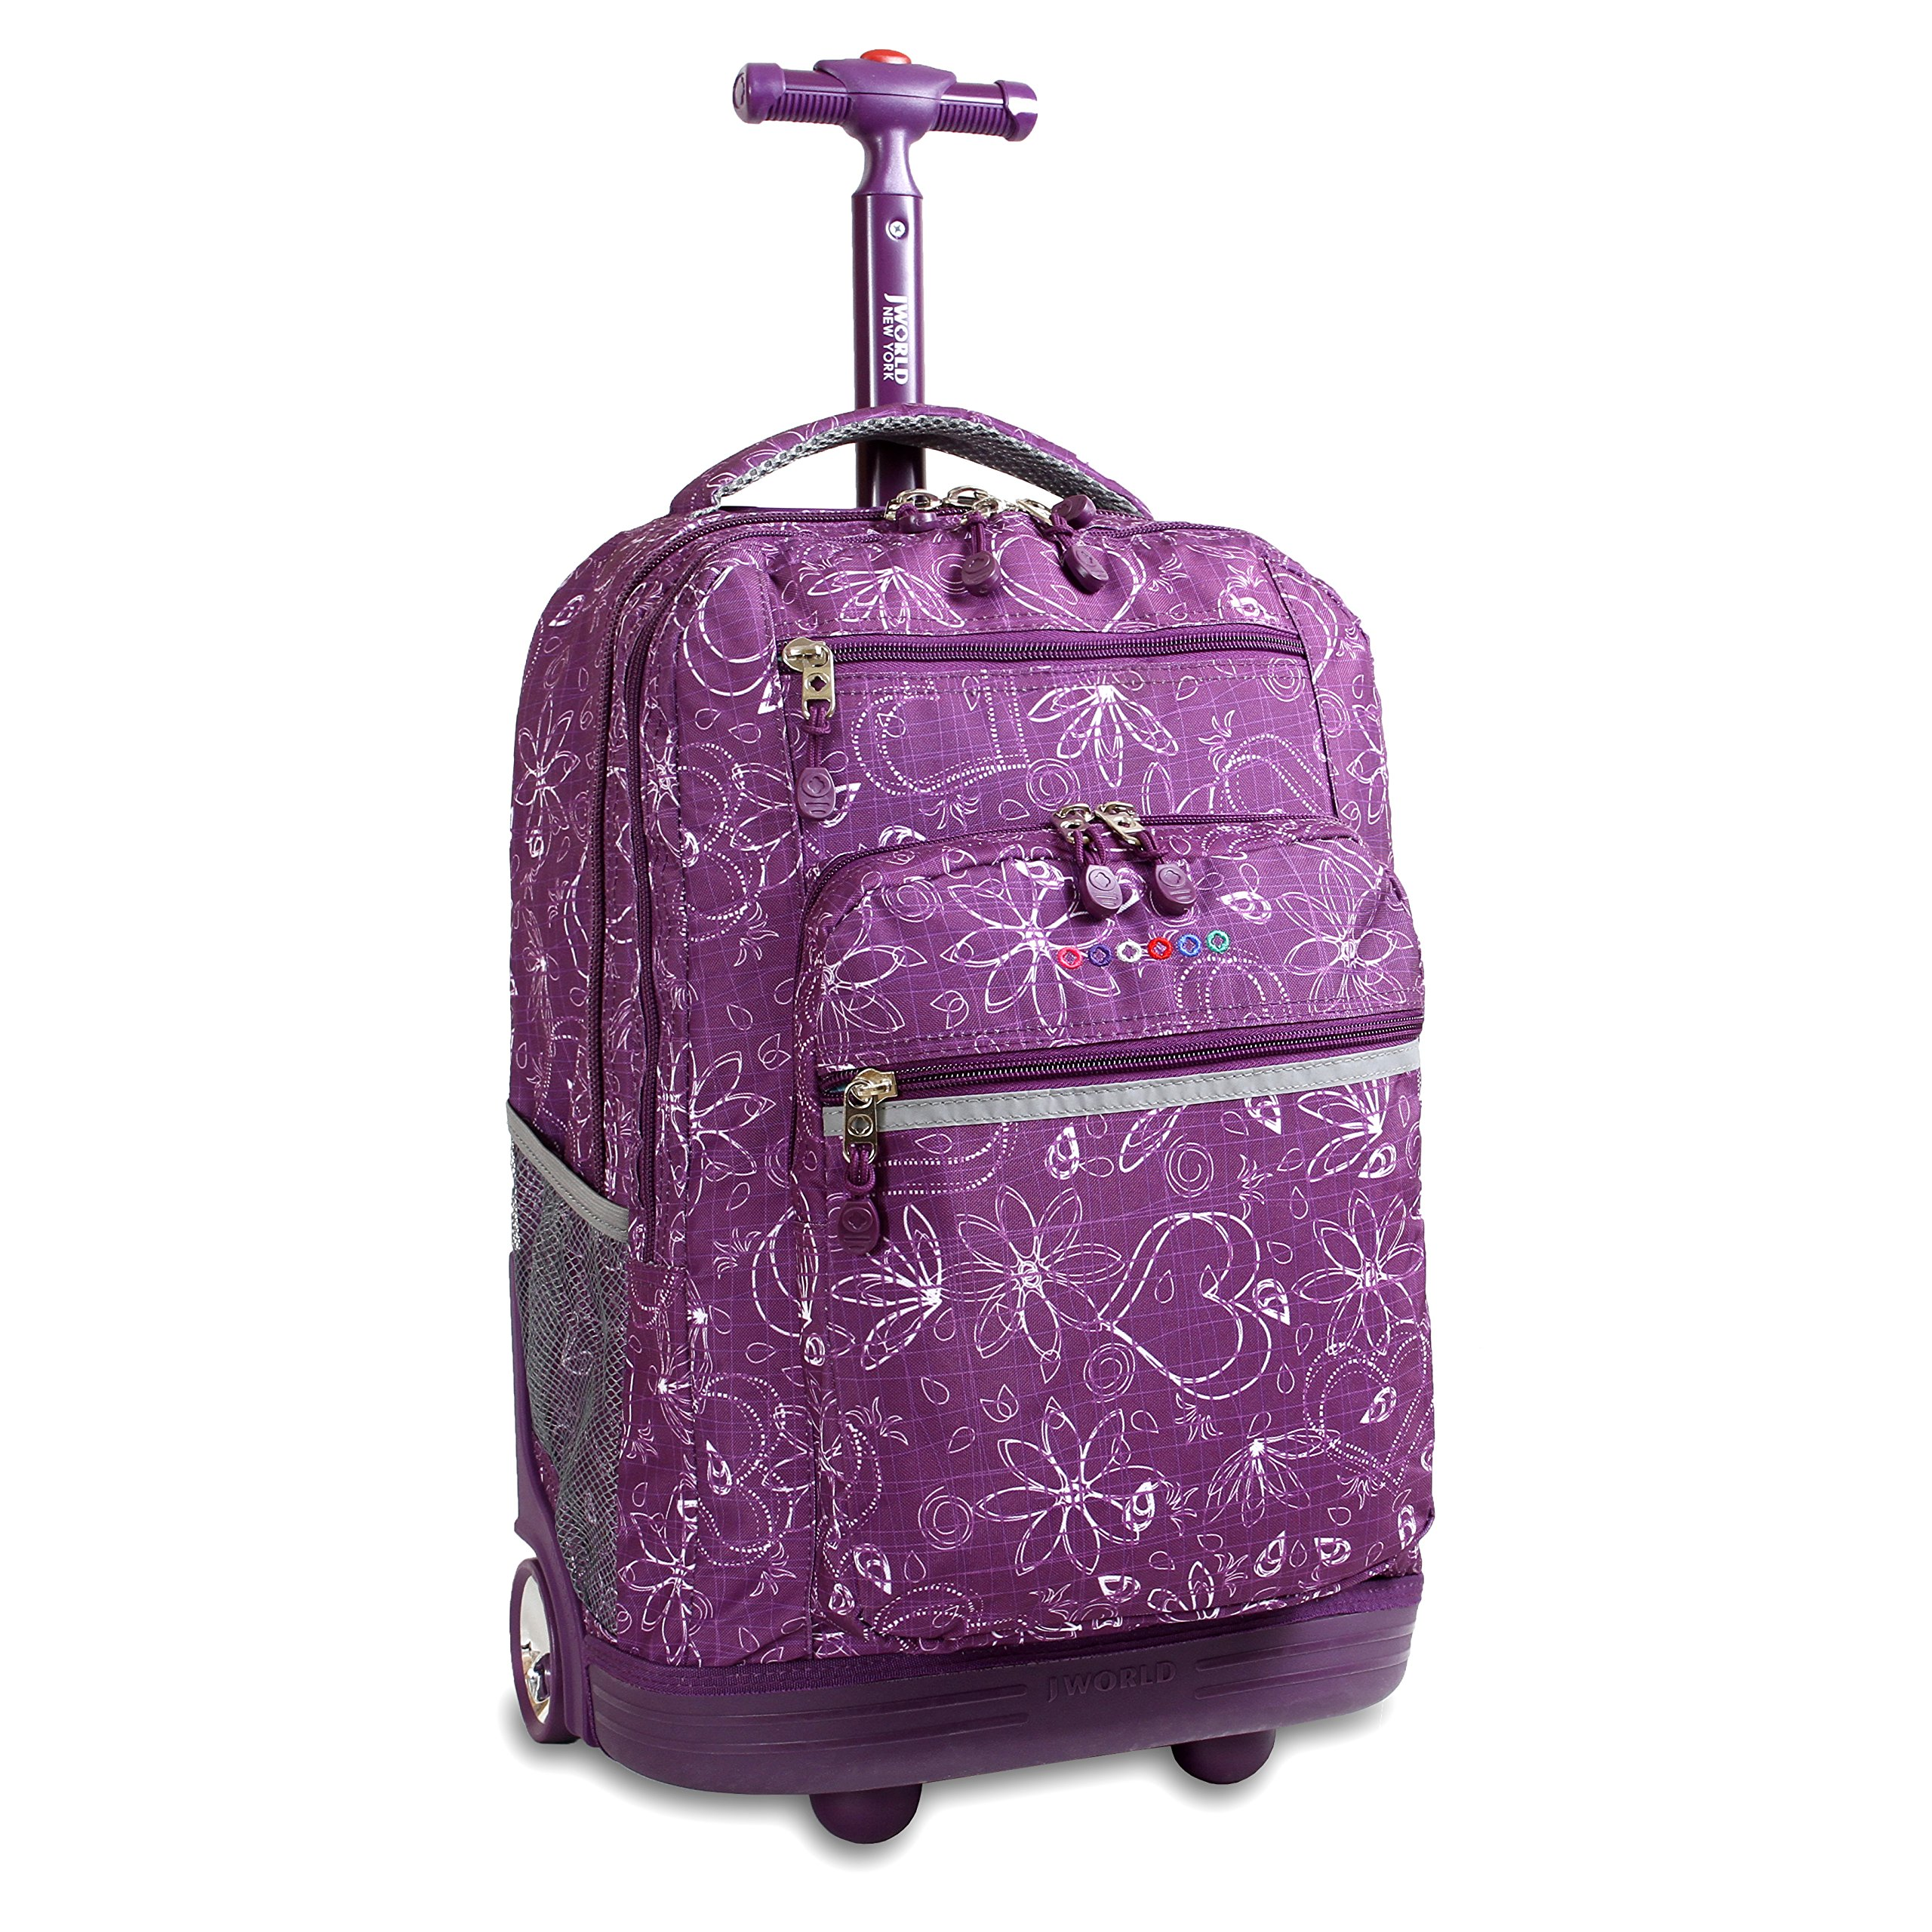 J World New York Sundance Rolling Backpack, Love Purple, One Size